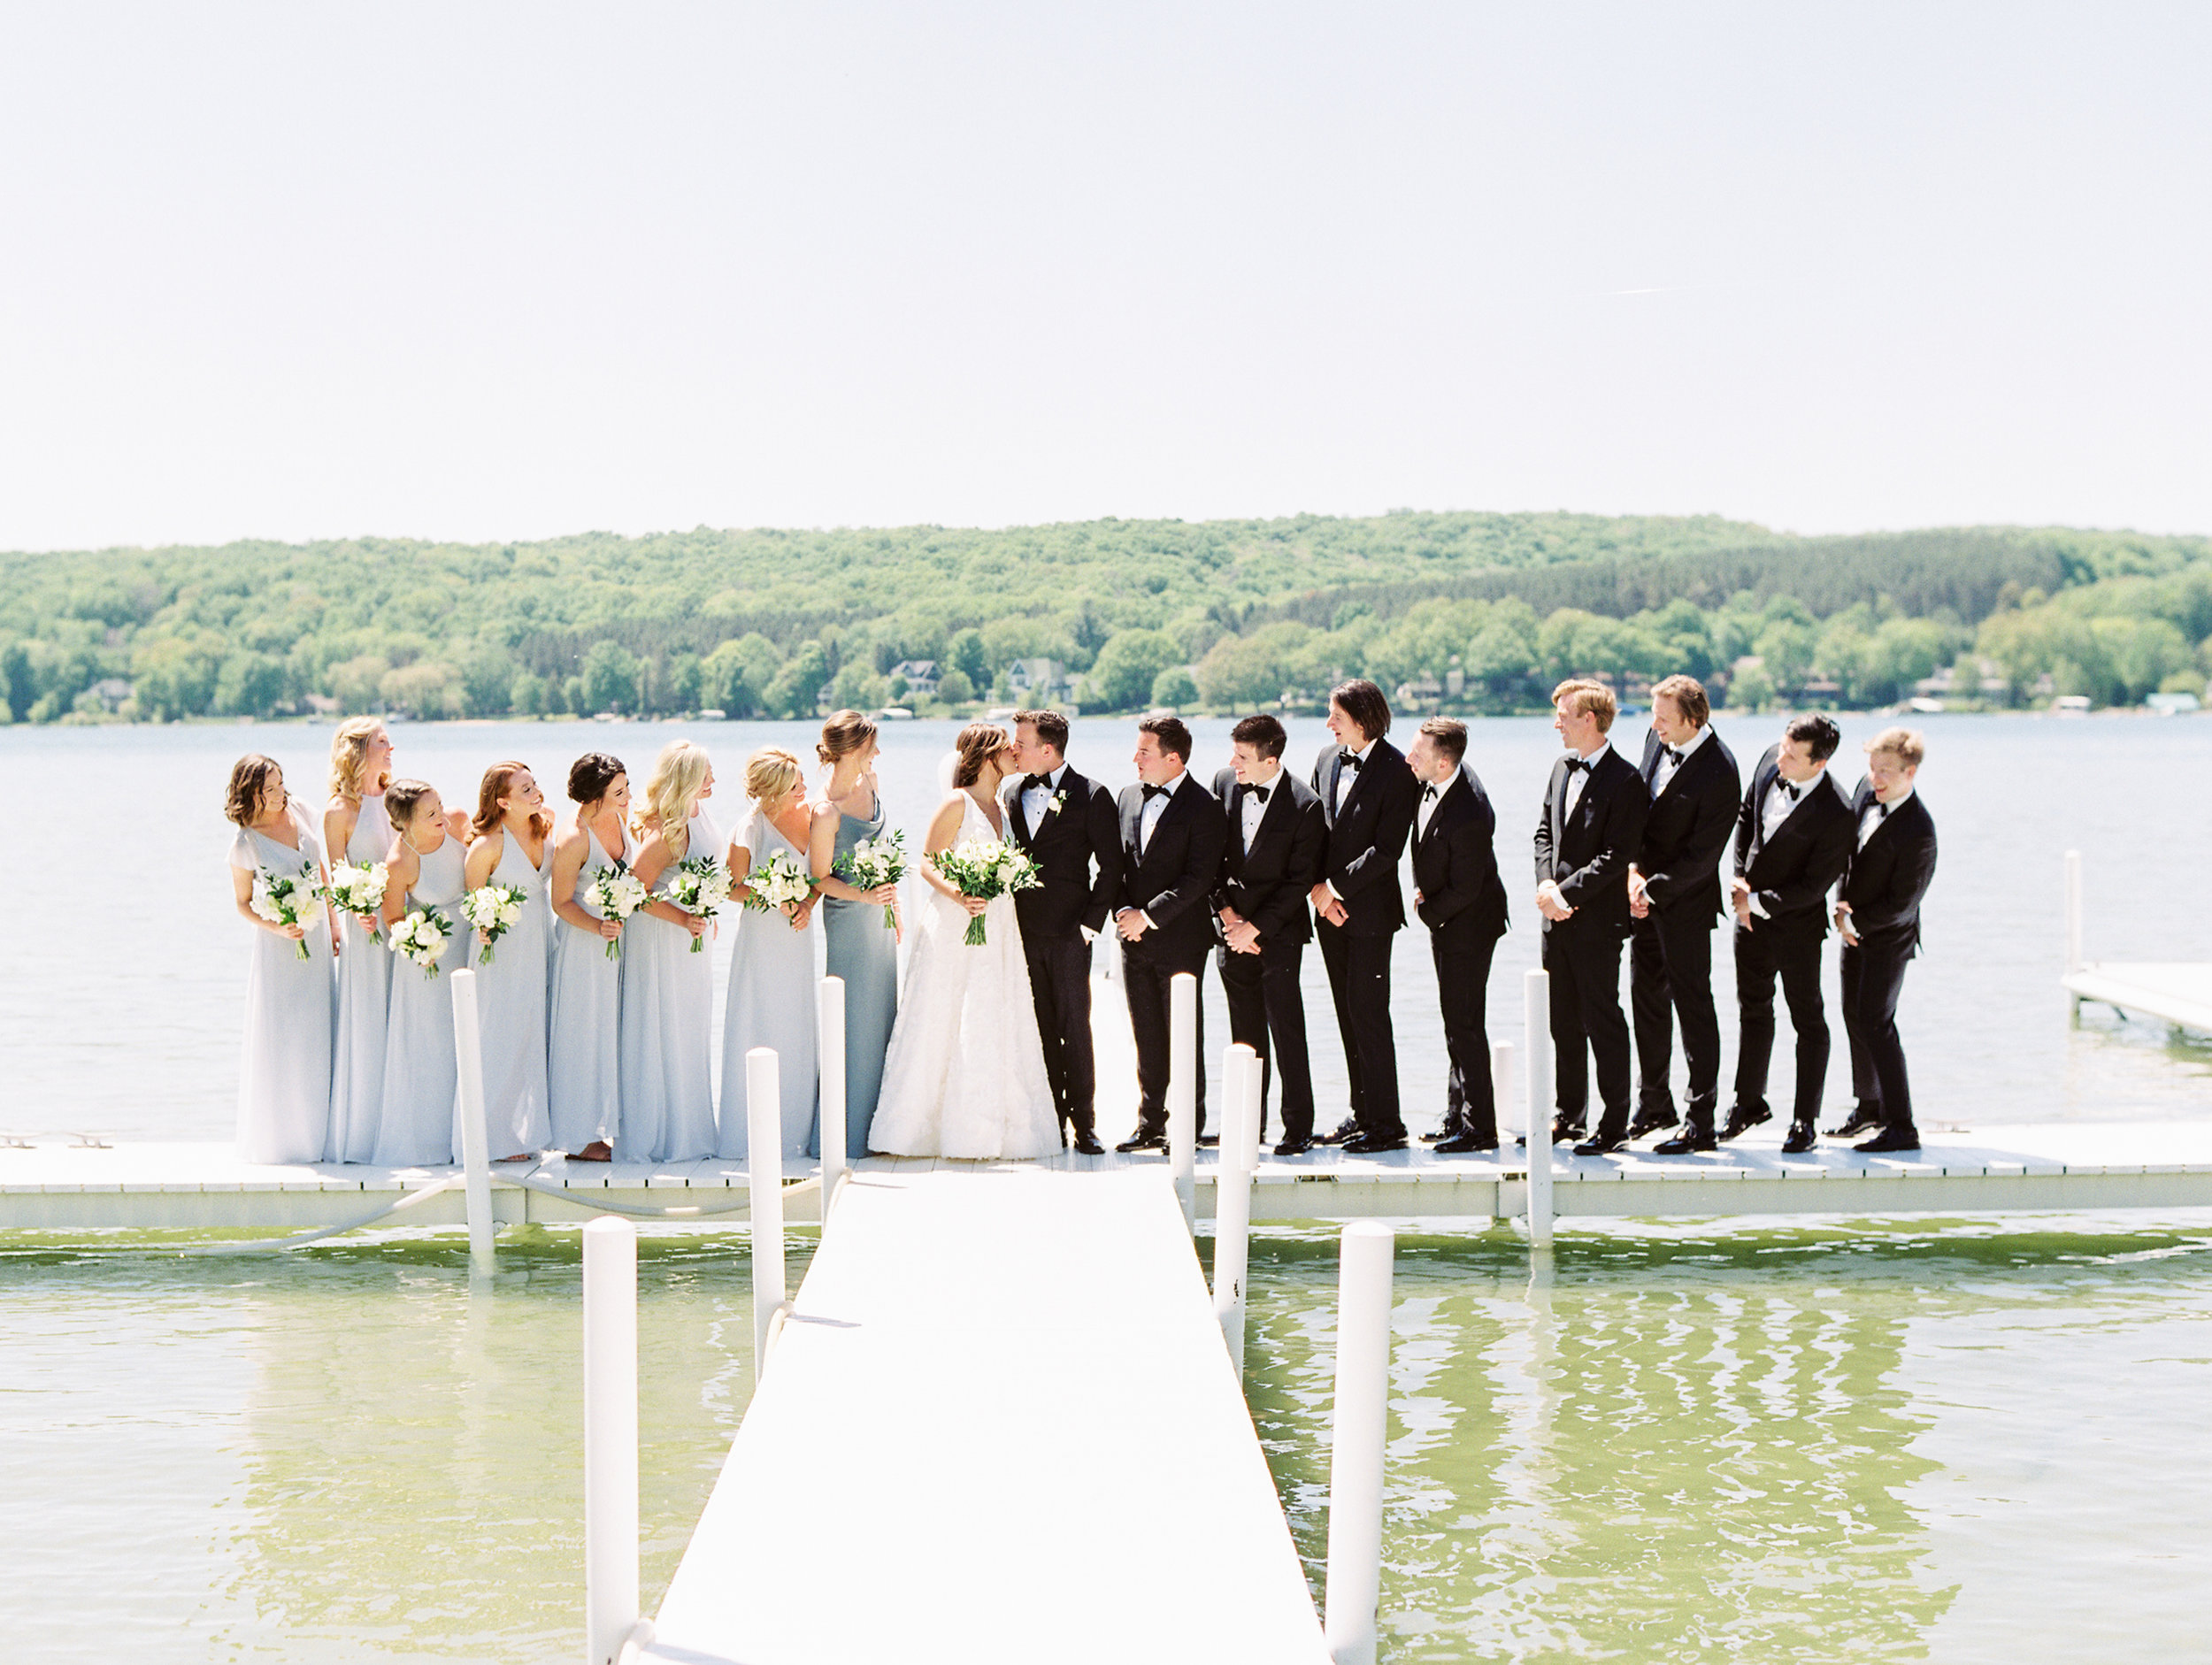 DeGuilio+Wedding+Bridal+Partyf-45.jpg